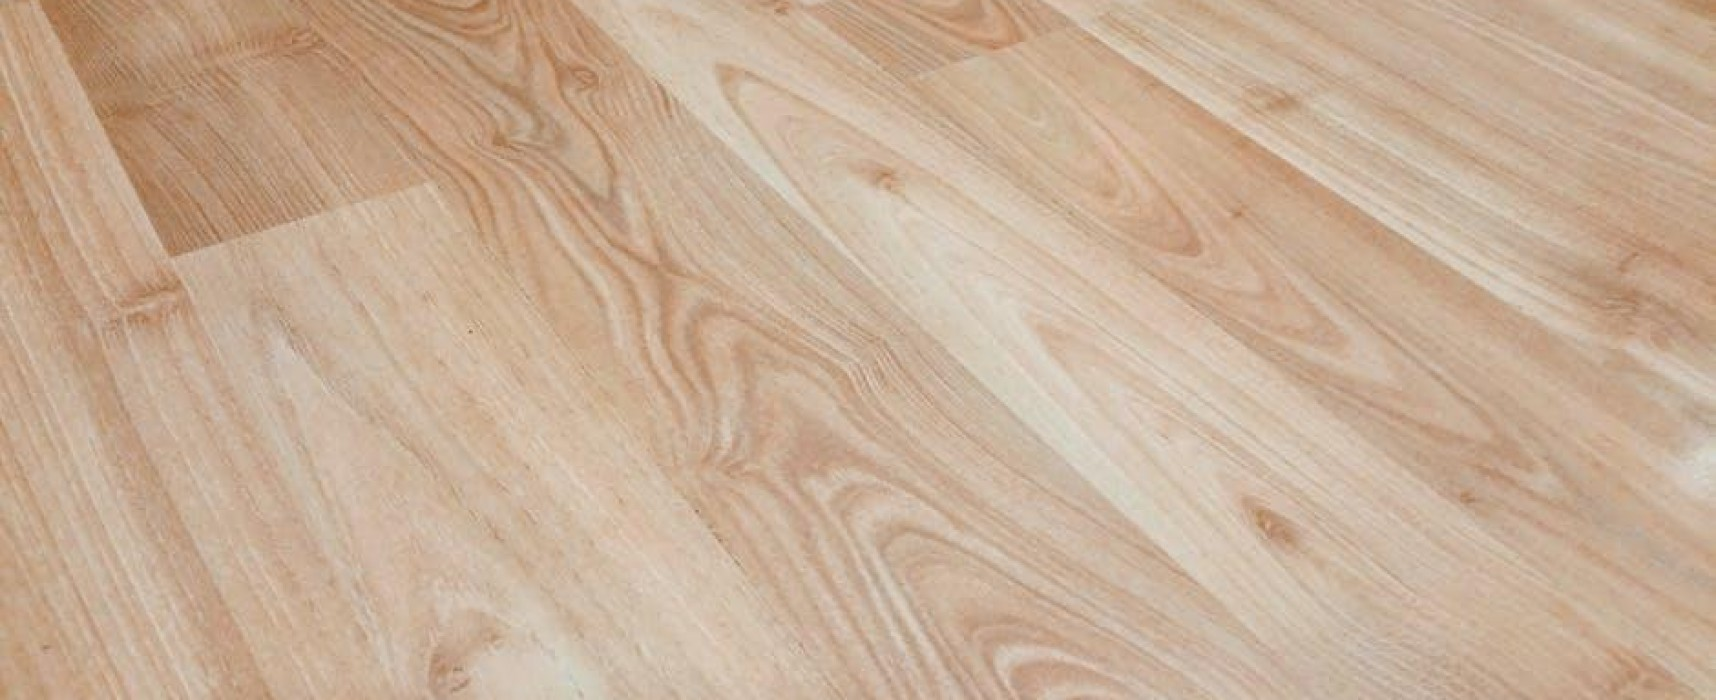 Advantages of Using Vinyl Wood Floors